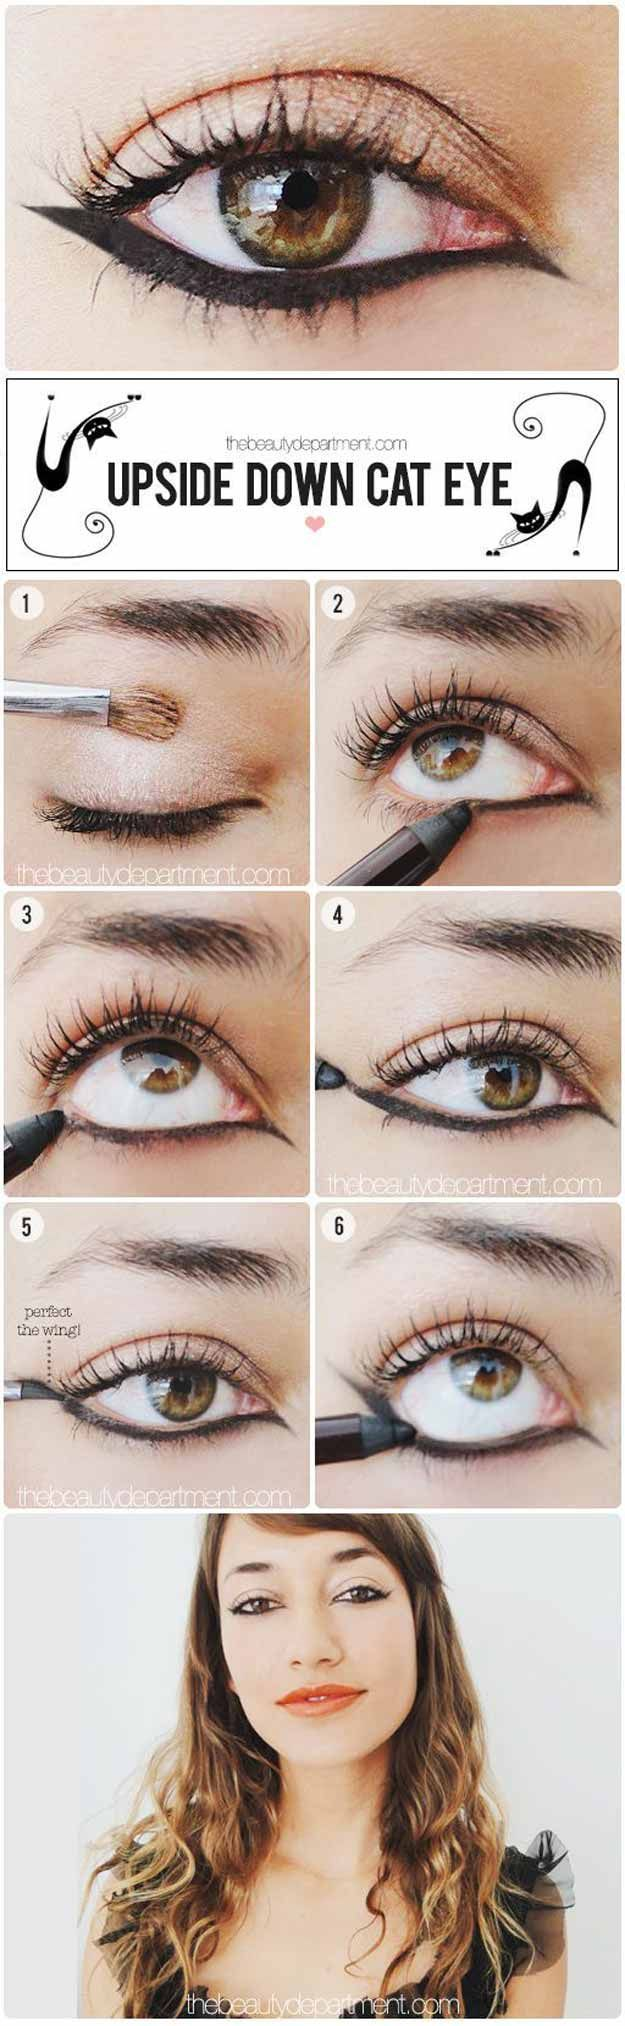 17 great eyeliner hacks from makeup tutorials the best diy projects diy ideas and tutorials sewing paper craft diy diy tips makeup tutorials 2017 2018 the best eyeliner tutorials baditri Images